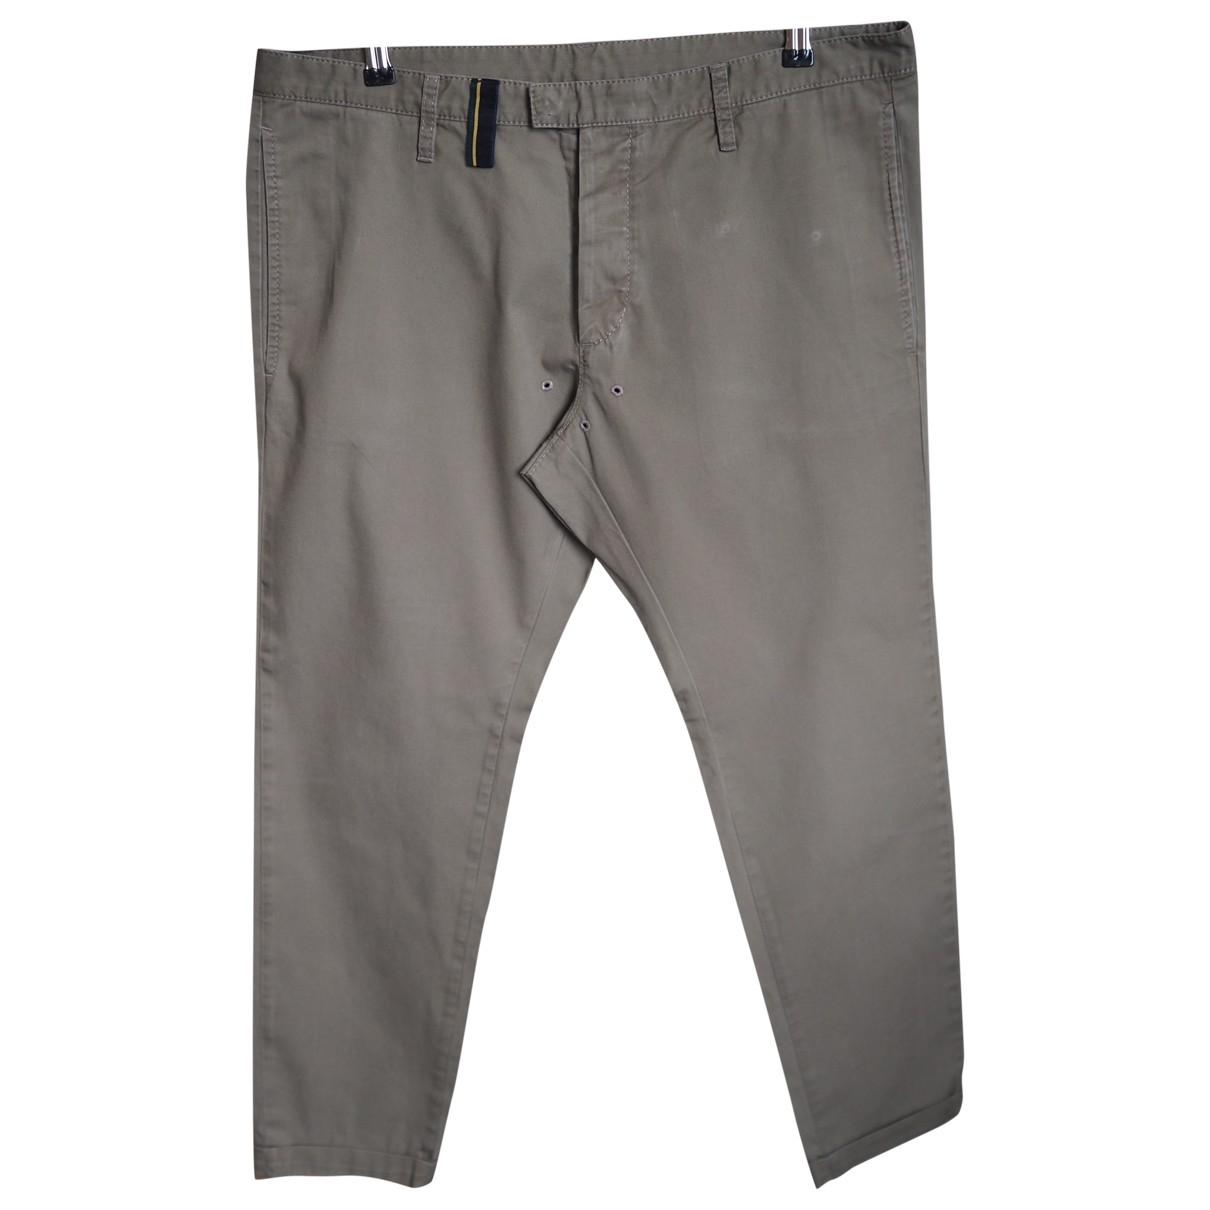 Pantalones en Algodon Beige Dsquared2